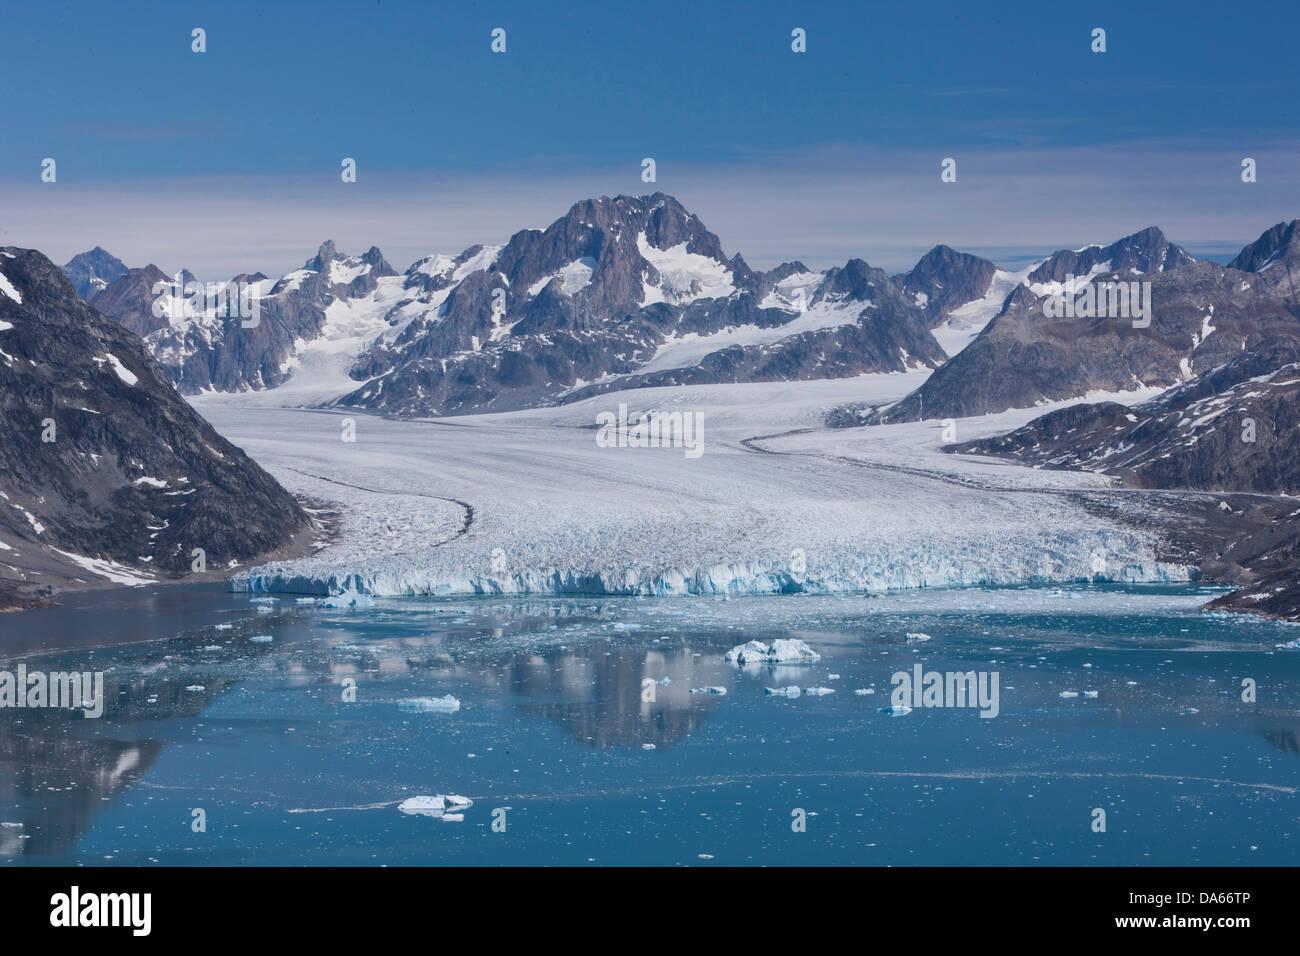 Sermiligaaq, view, Knut Rasmussen, Rasmussen, Greenland, East Greenland, glacier, ice, moraine, Stock Photo